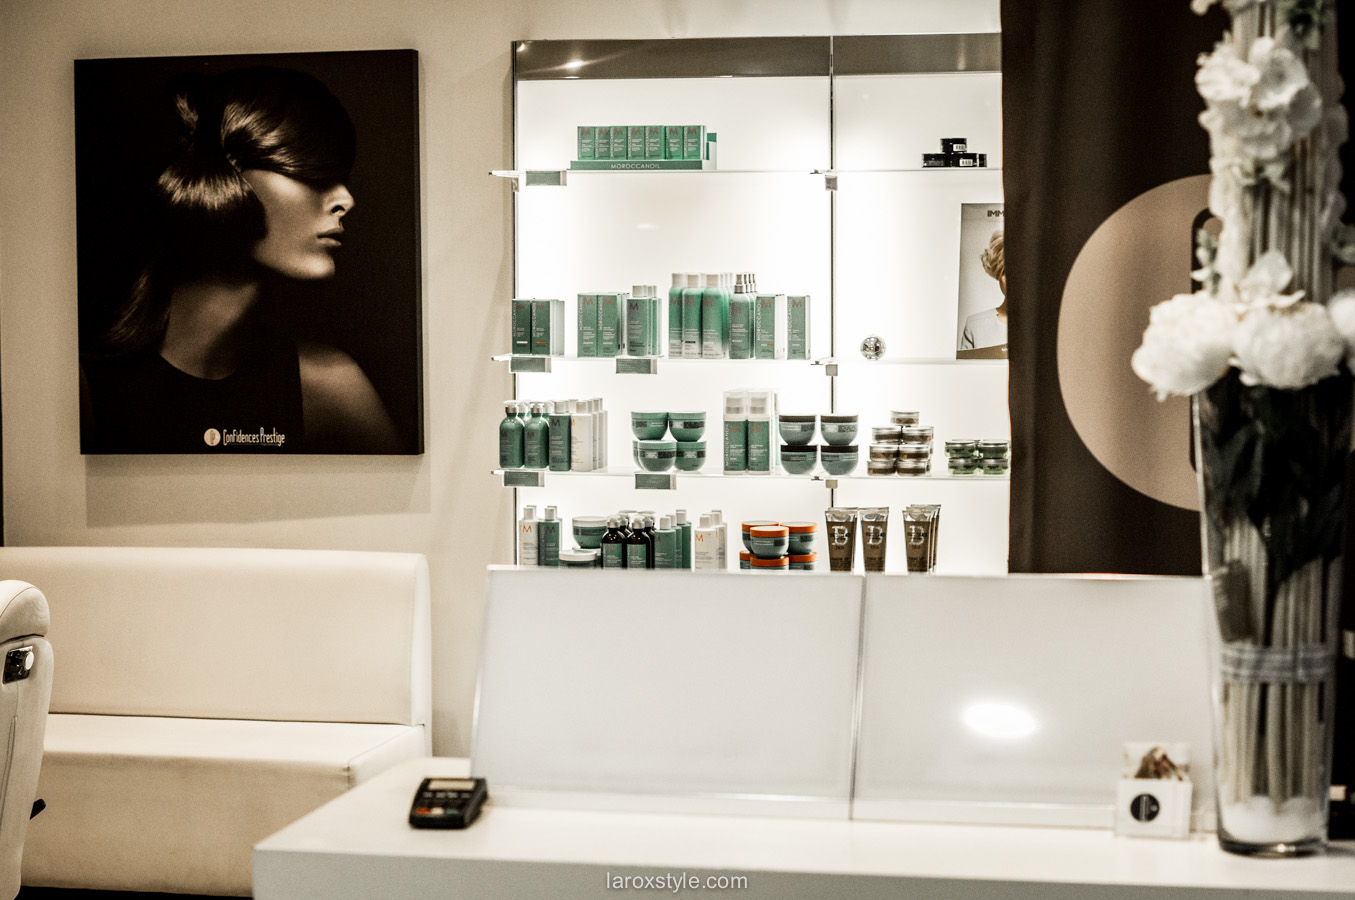 Salon confidences prestige lyon - coiffeur lyon